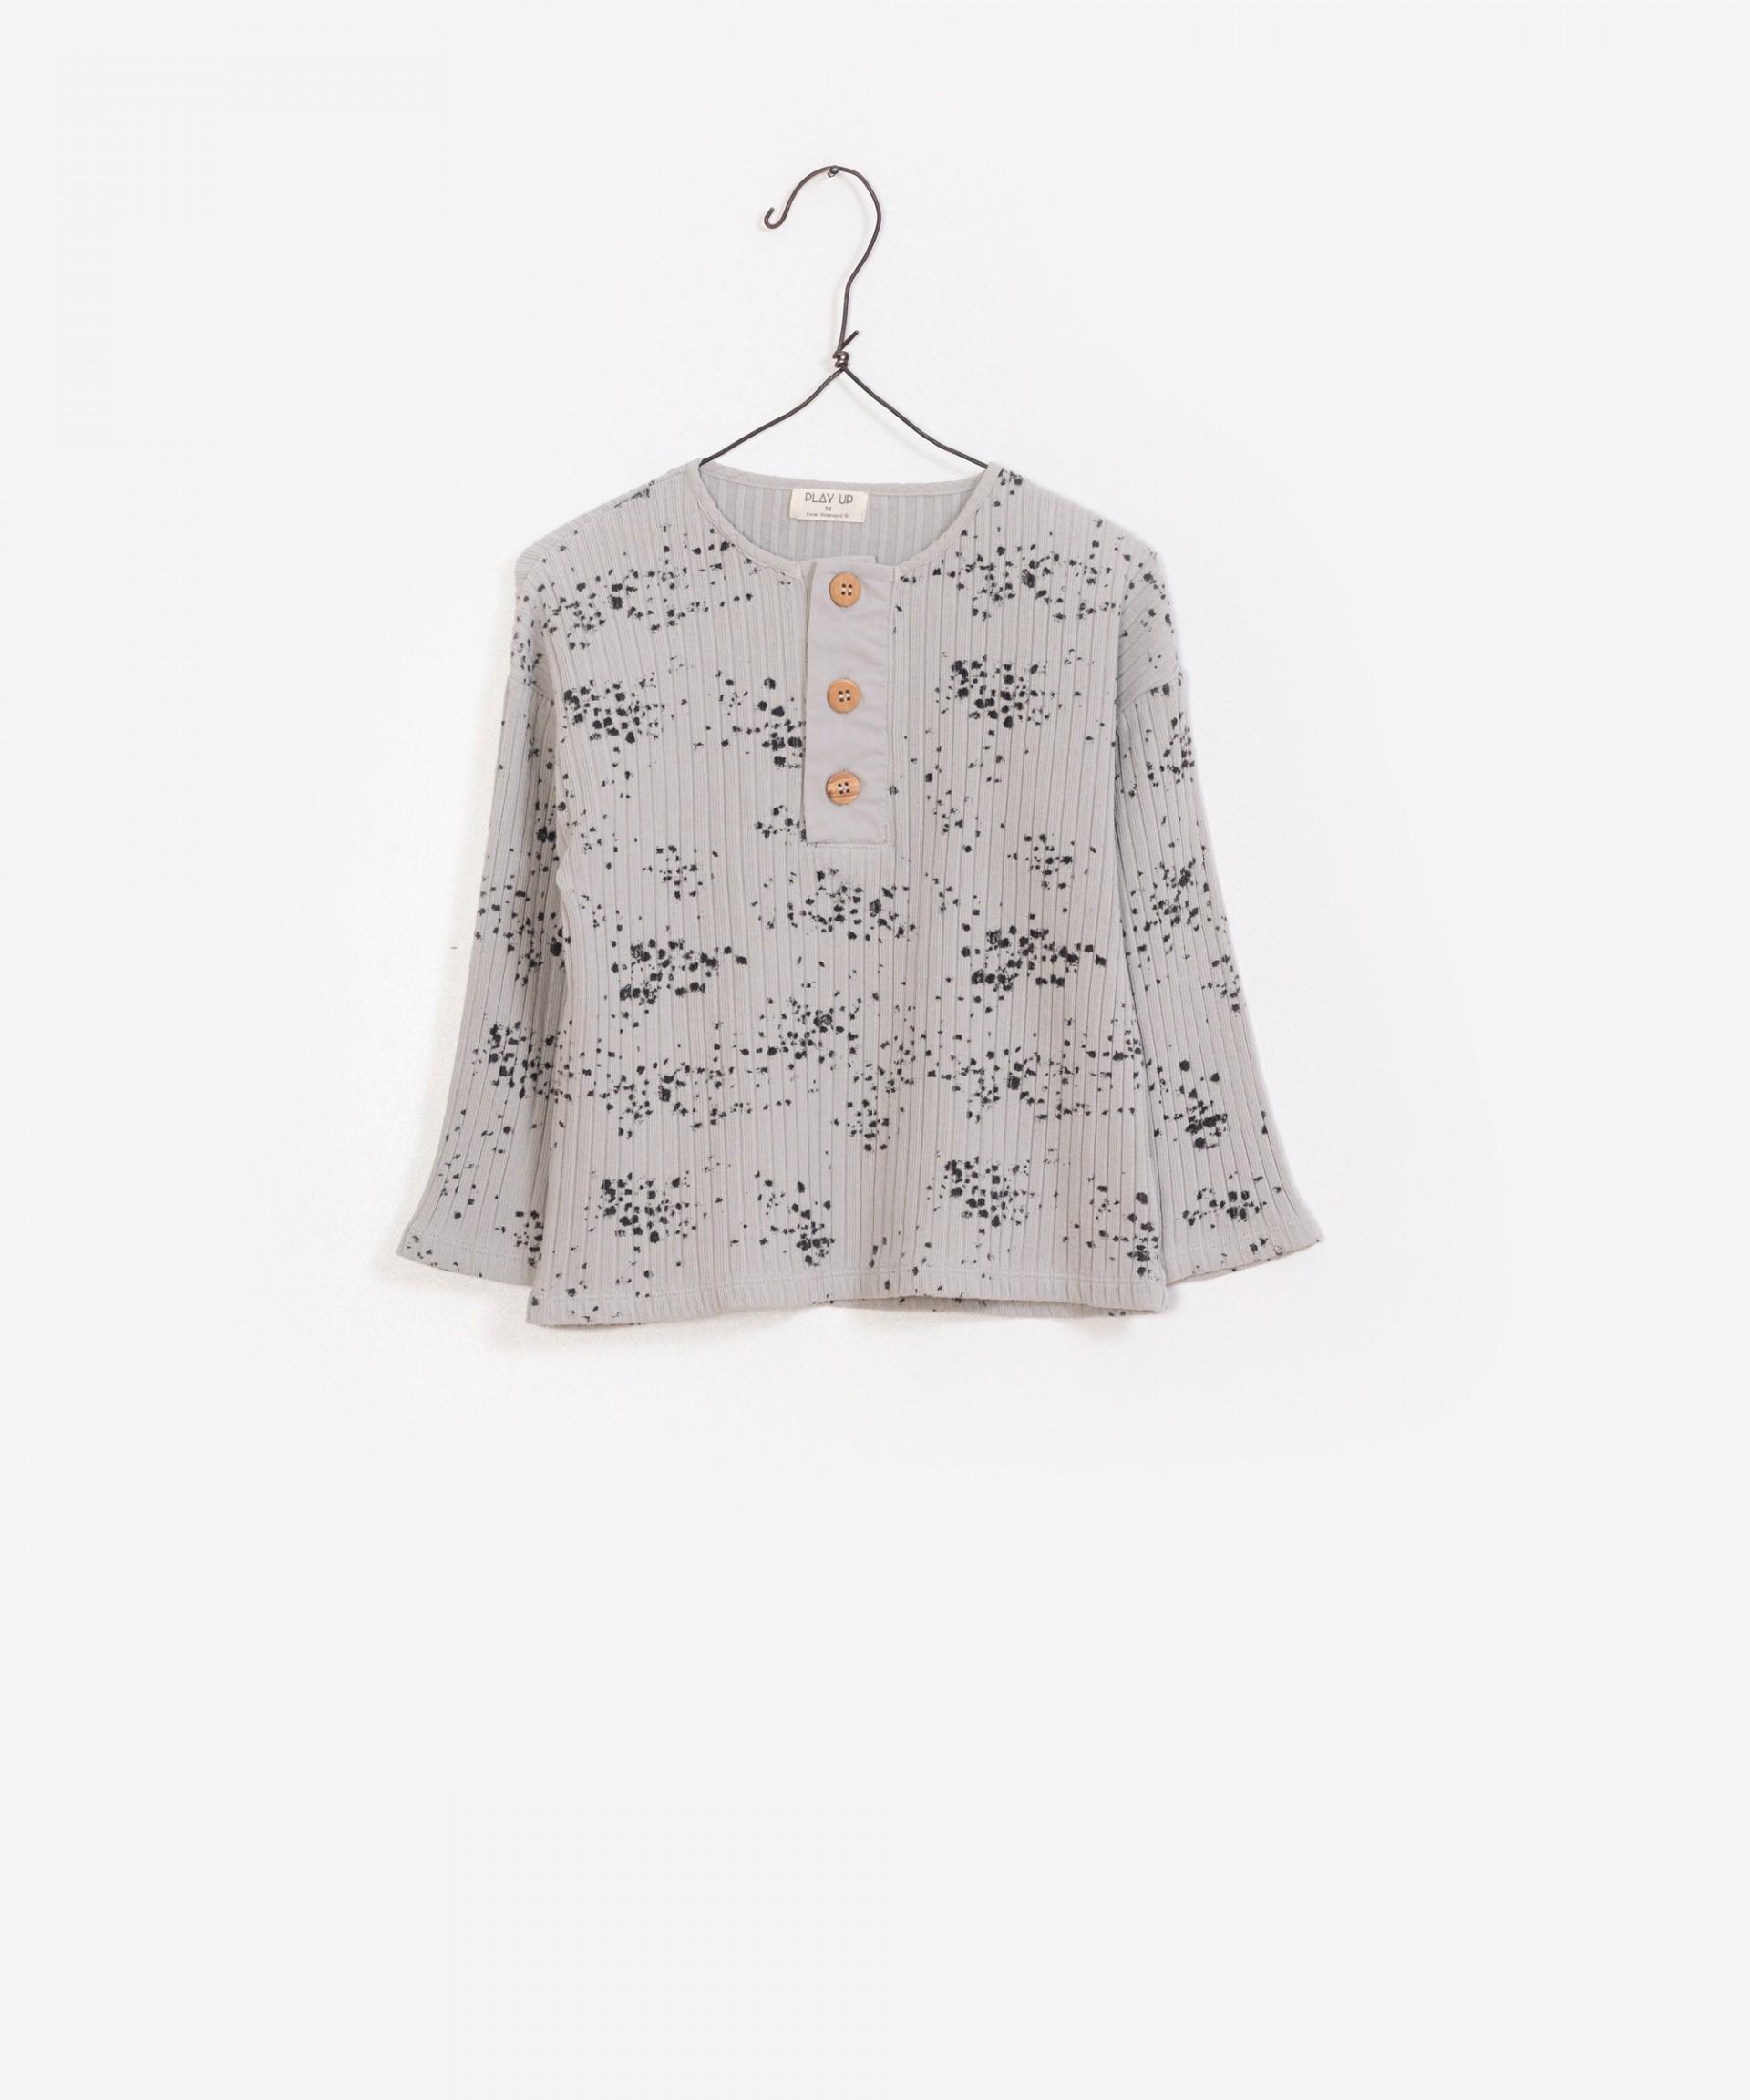 T-Shirt Rib Canelado Estampada